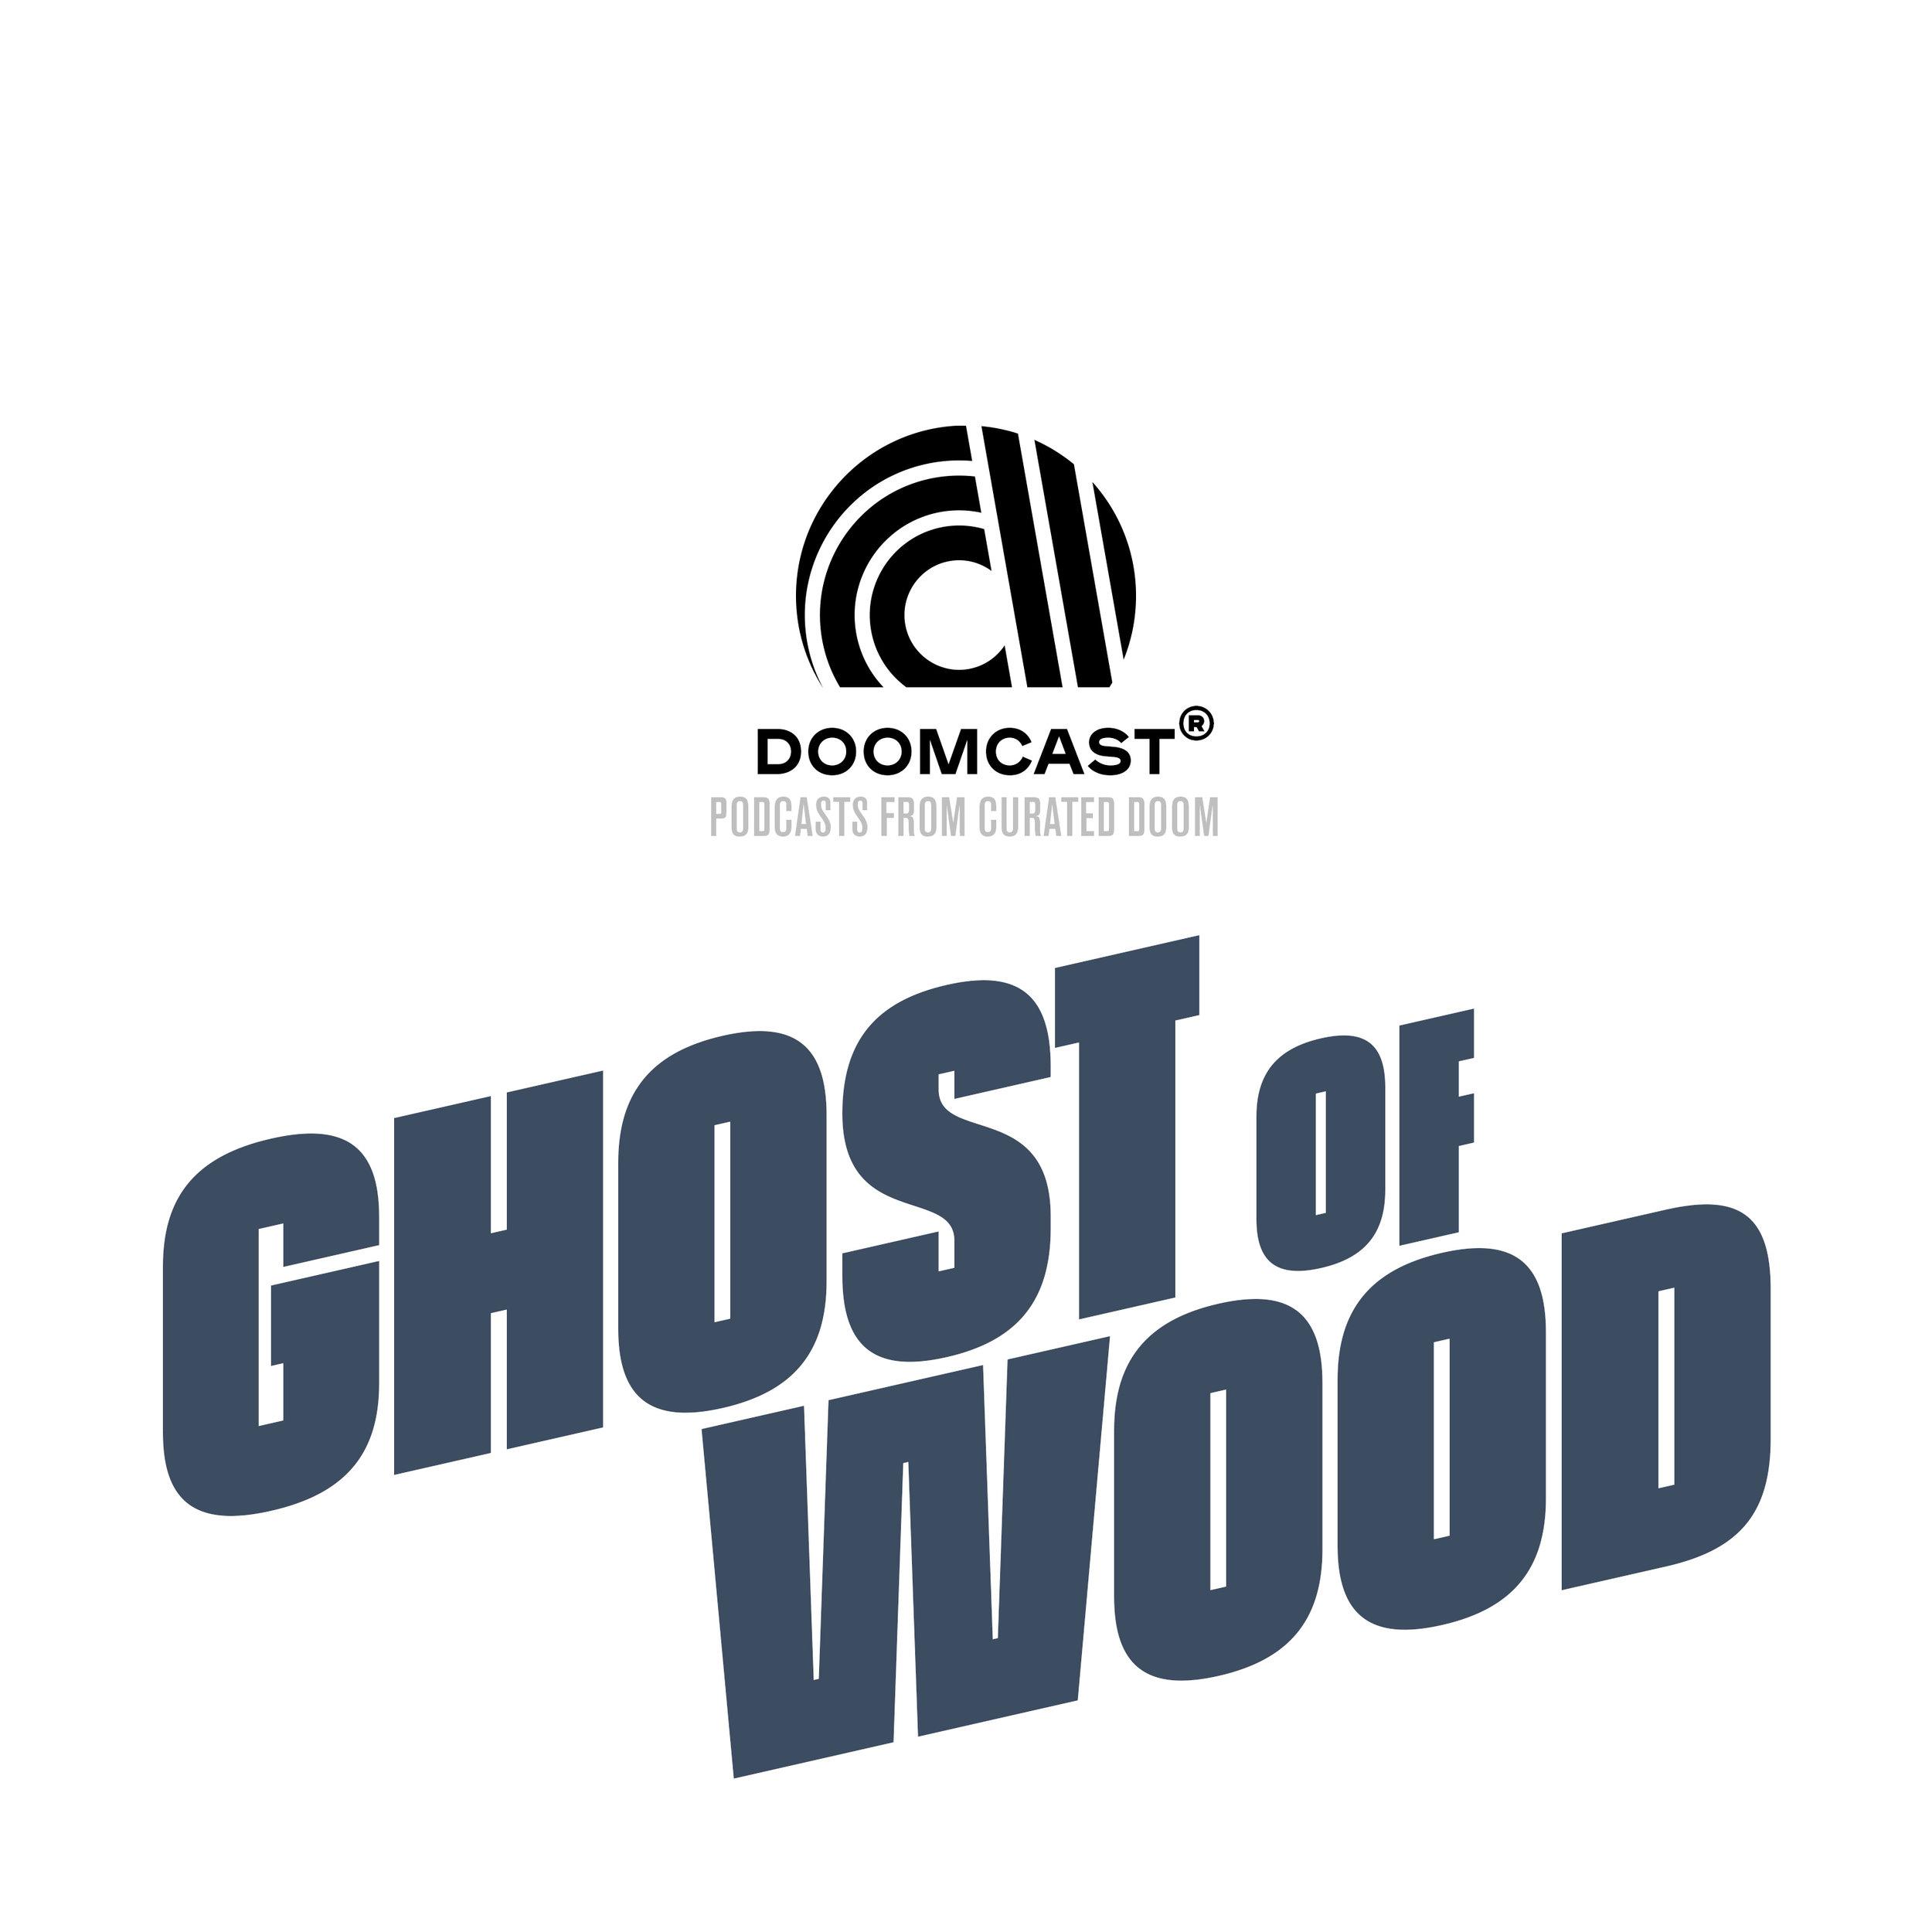 DOOMCAST-Ghost of Wood_Promo02.jpg